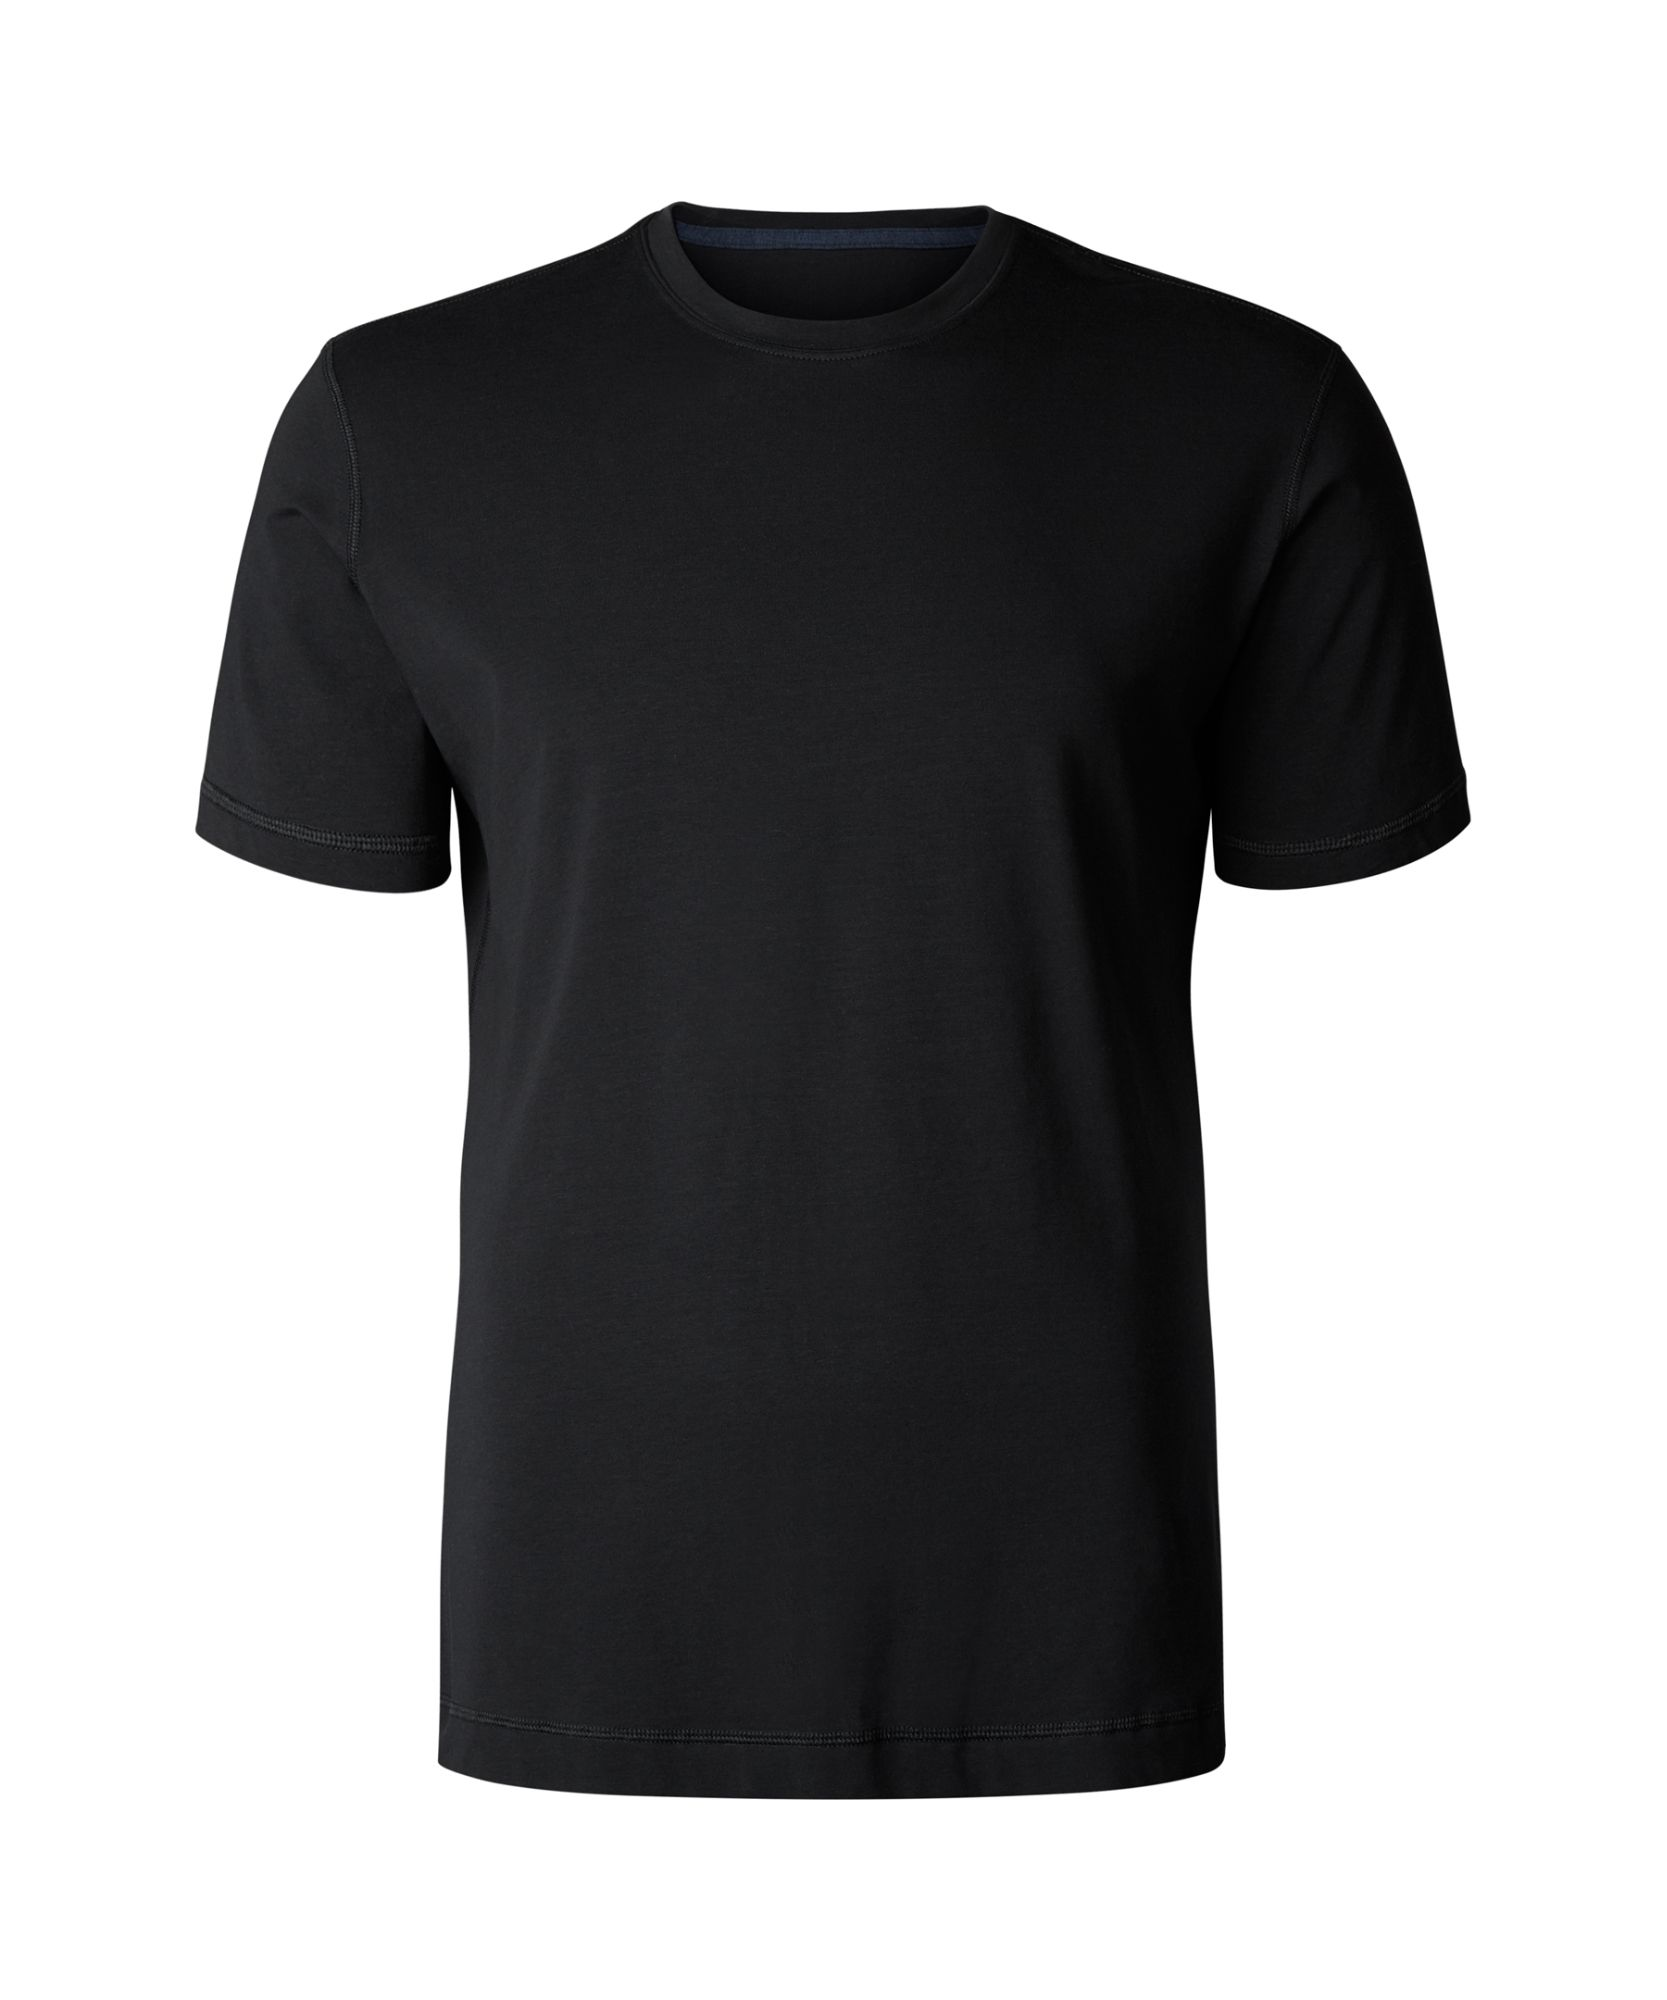 5 Year Basic Tee Updated Fit Men S Short Sleeve Tops Lululemon T Shirt Png Printed Shirts Shirt Print Design